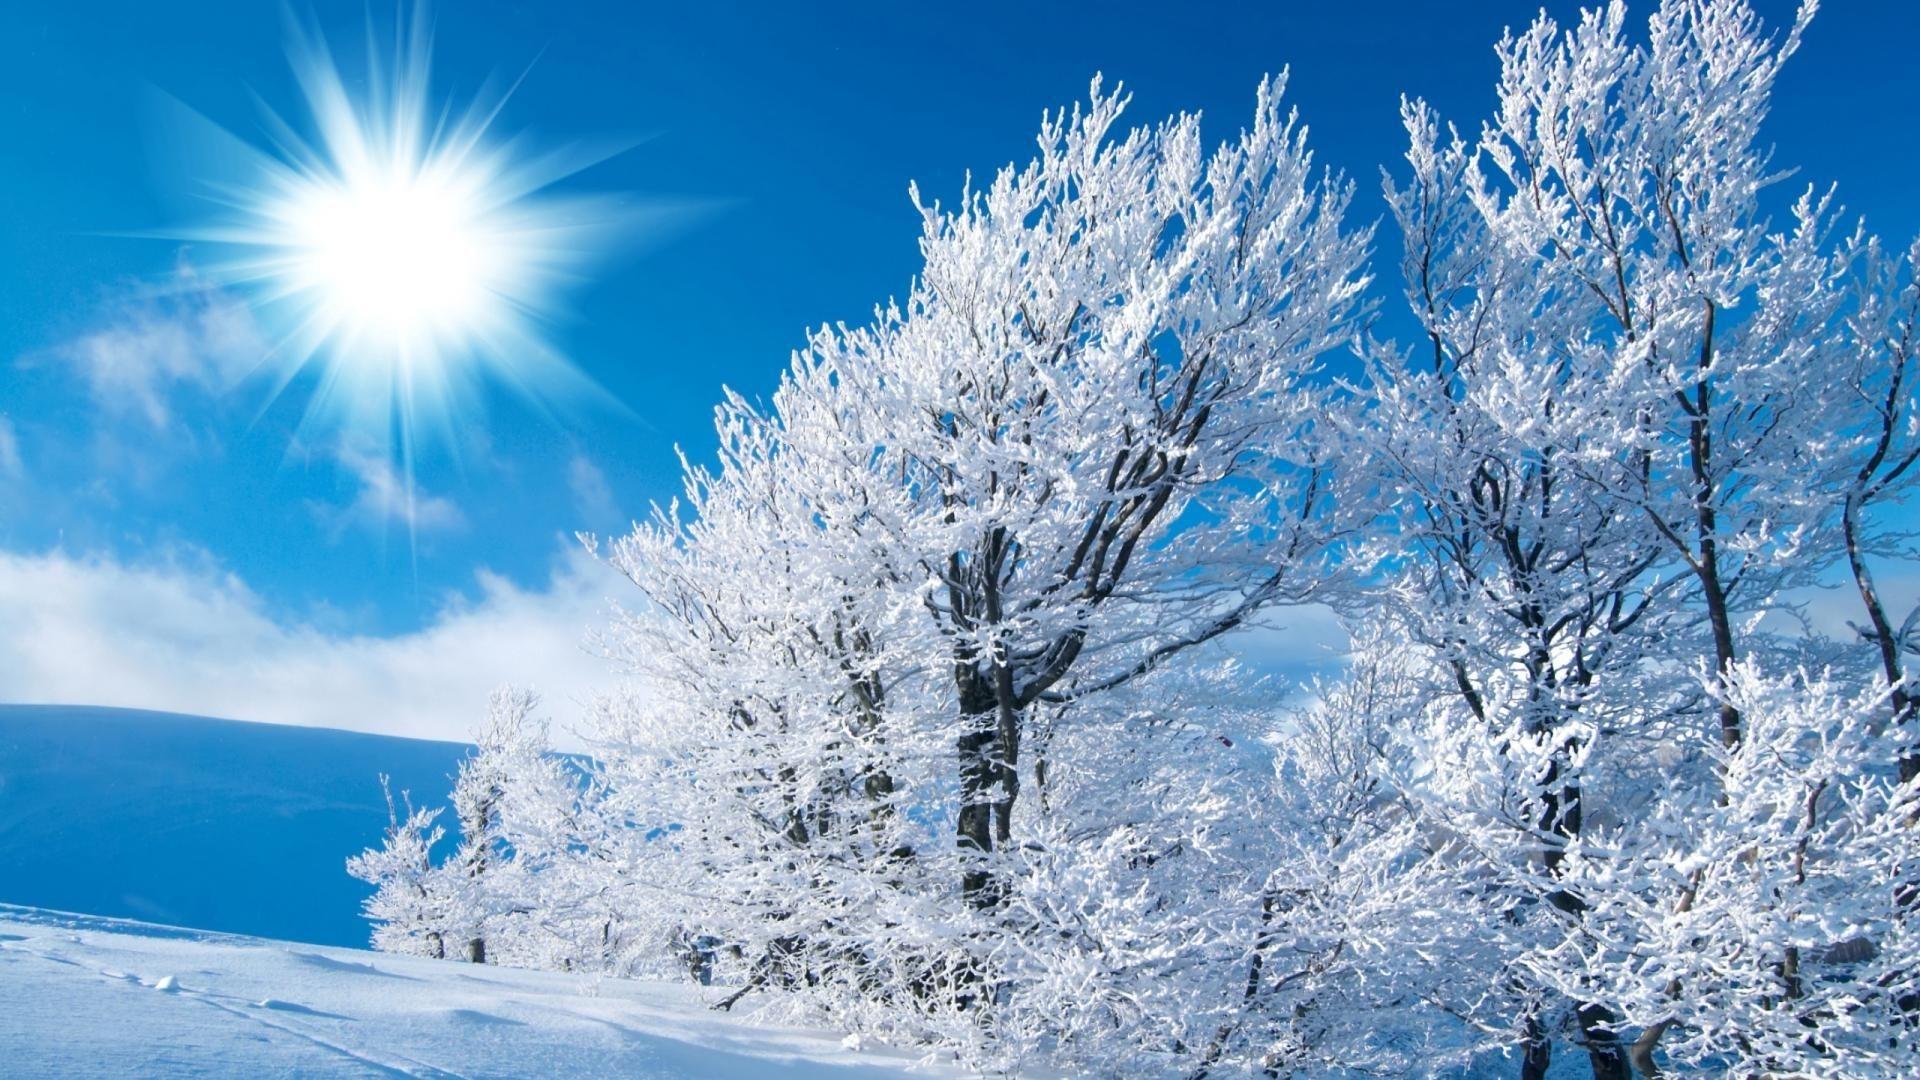 1080p Winter Wallpaper (65+ Images